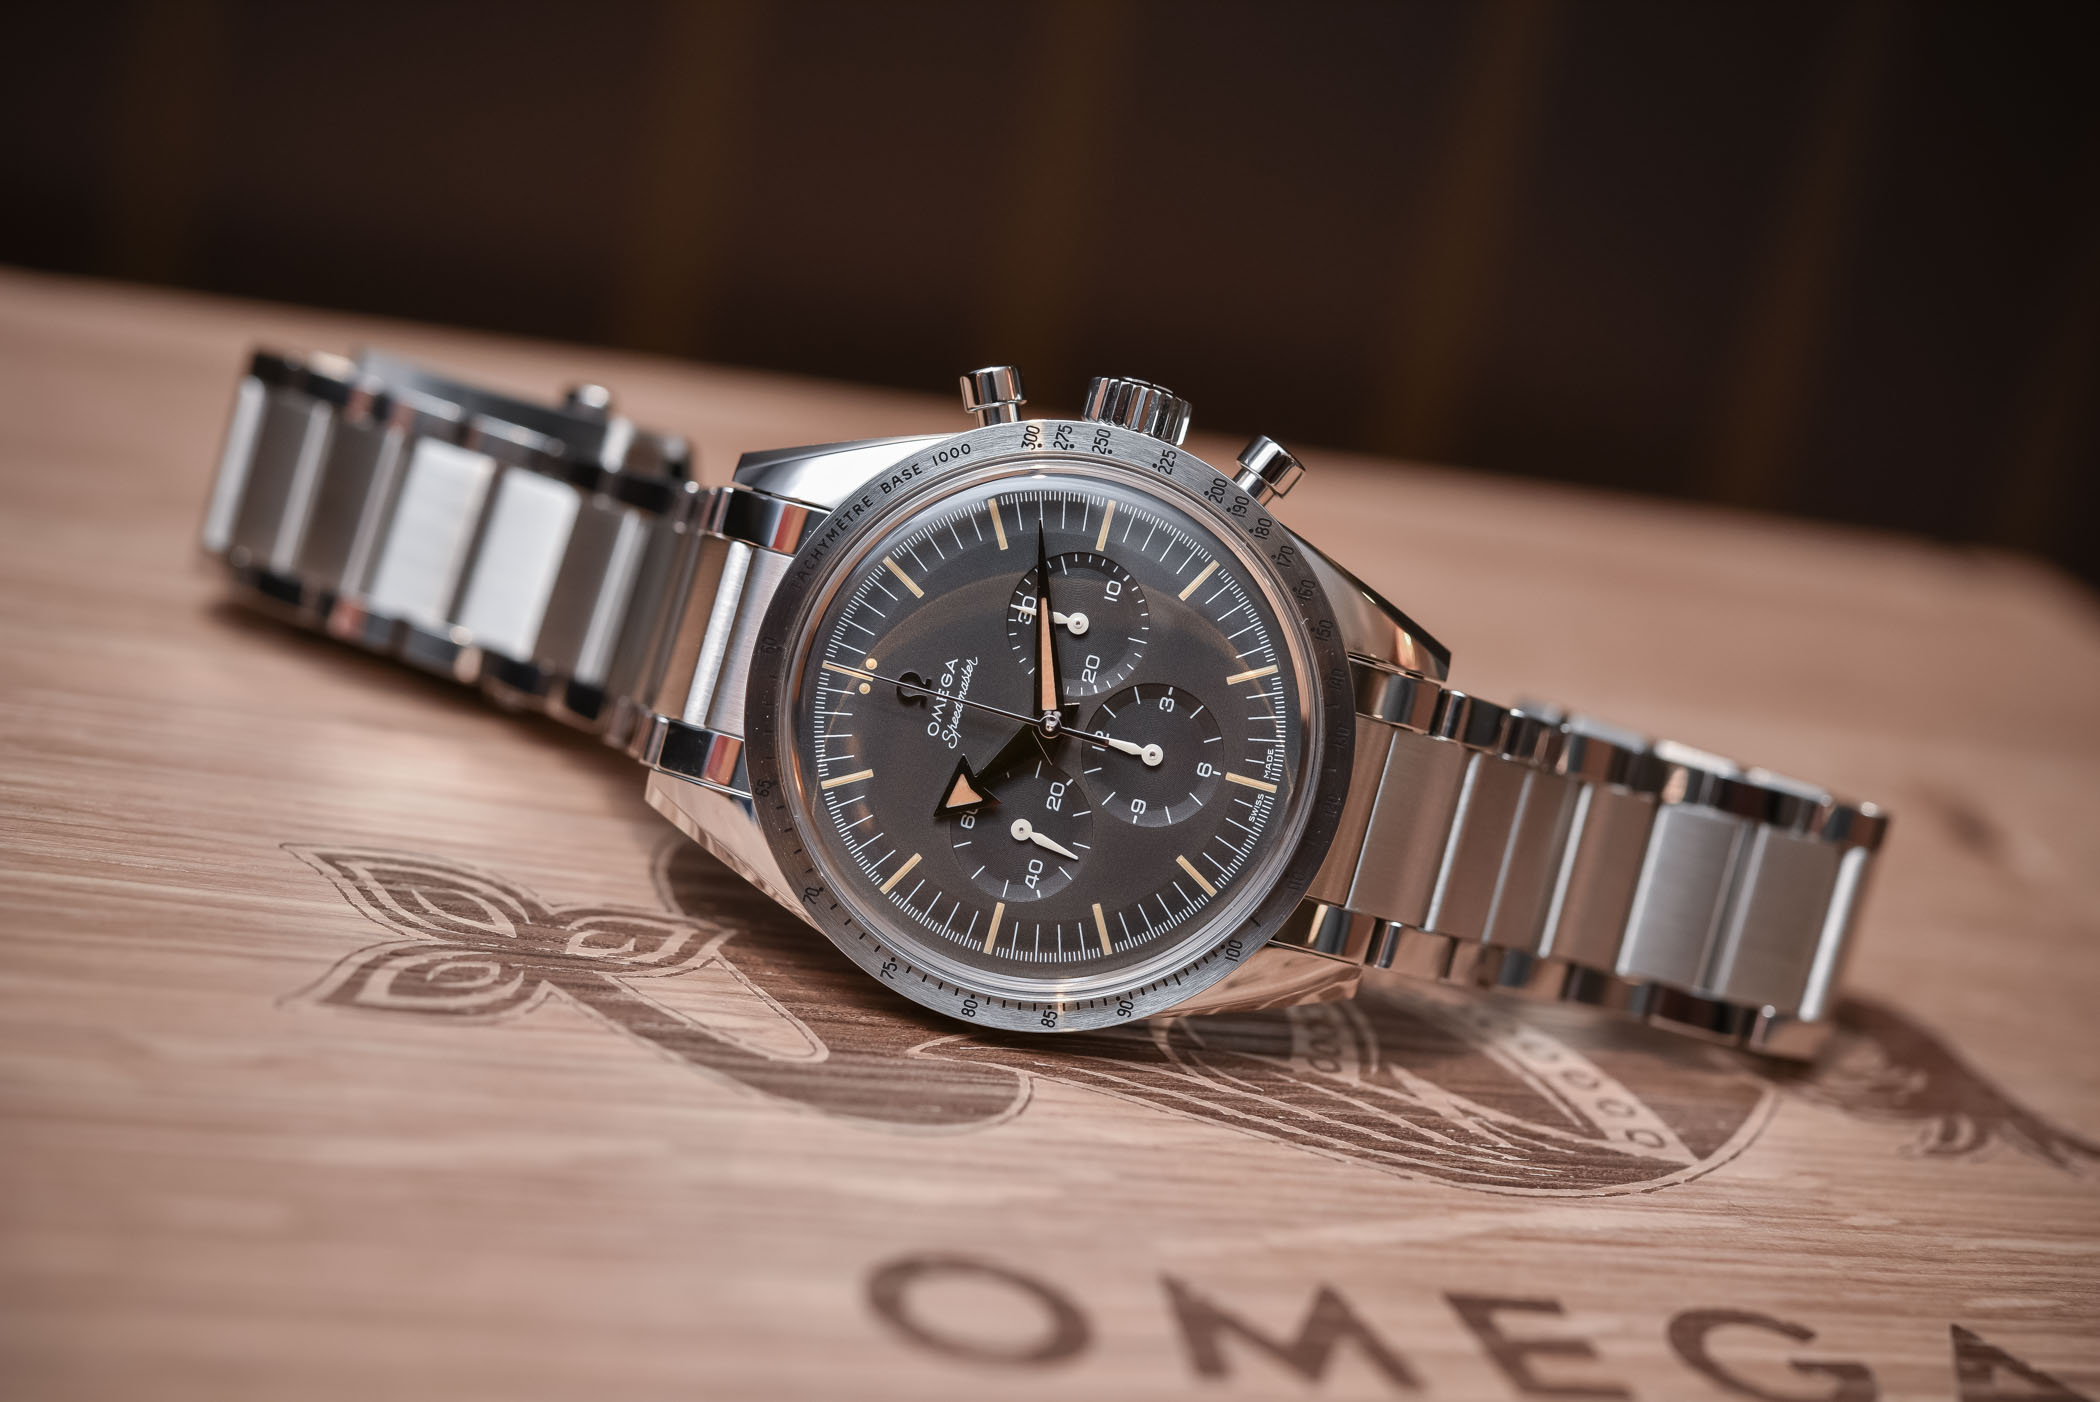 Omega Speedmaster 60th Anniversary Limited Edition